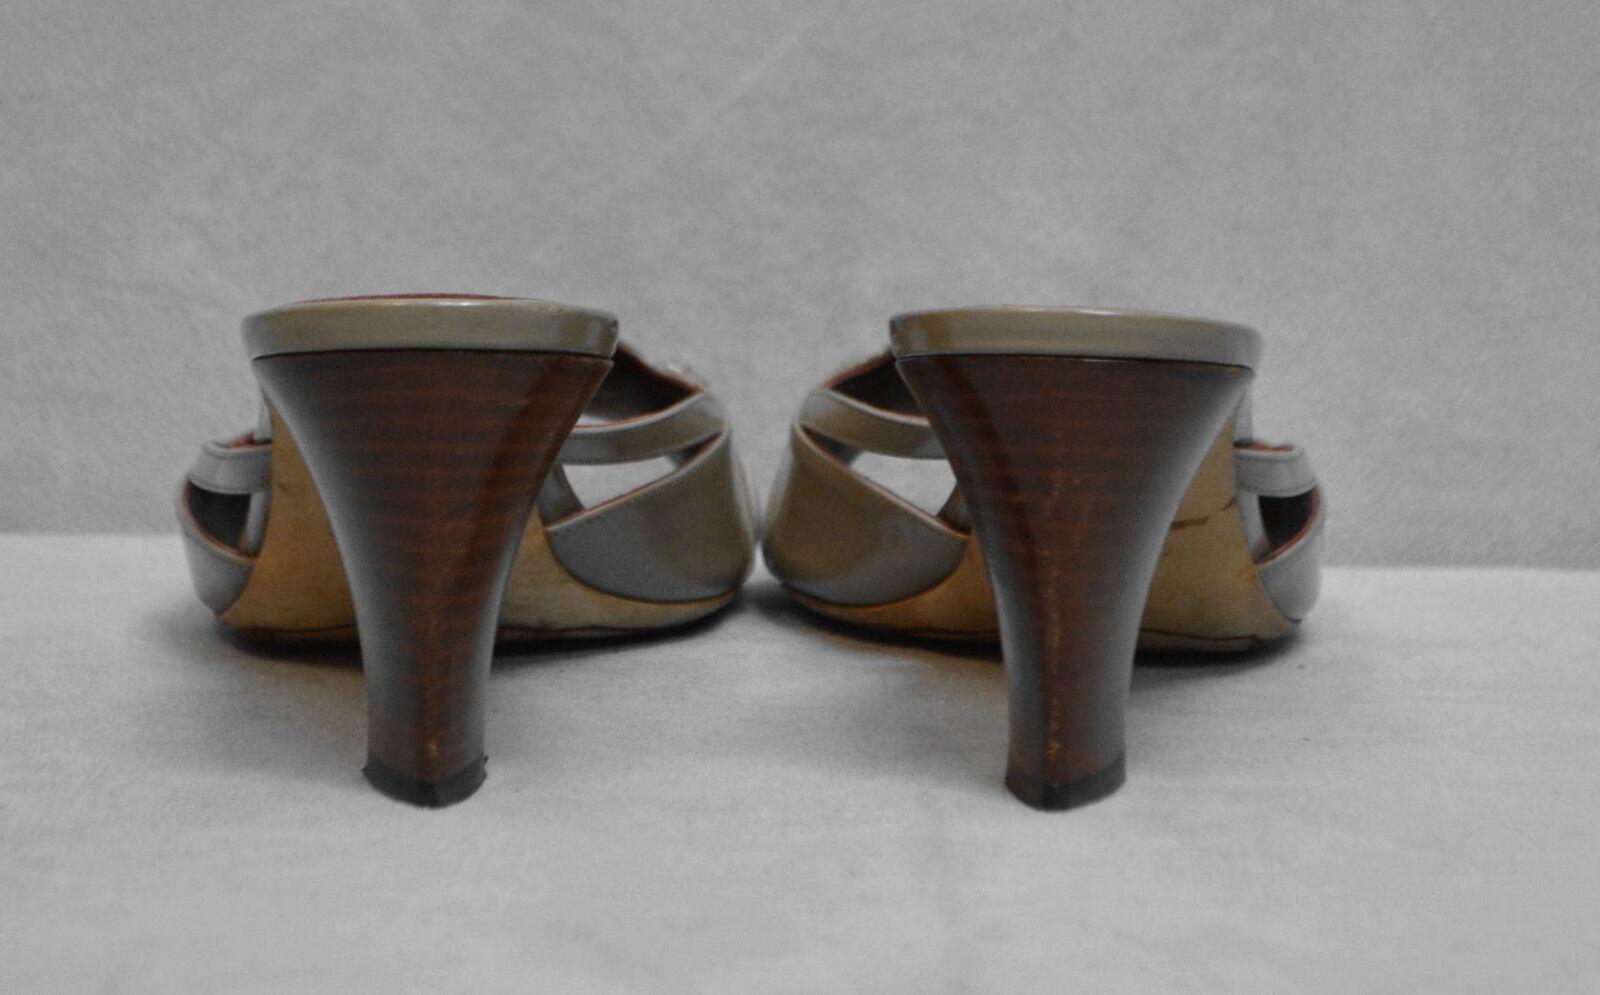 B6 Auth CELINE Grey Patent Patent Patent Leather Logo Buckle Slide Sandal Heels shoes Sz 39.5 f95824